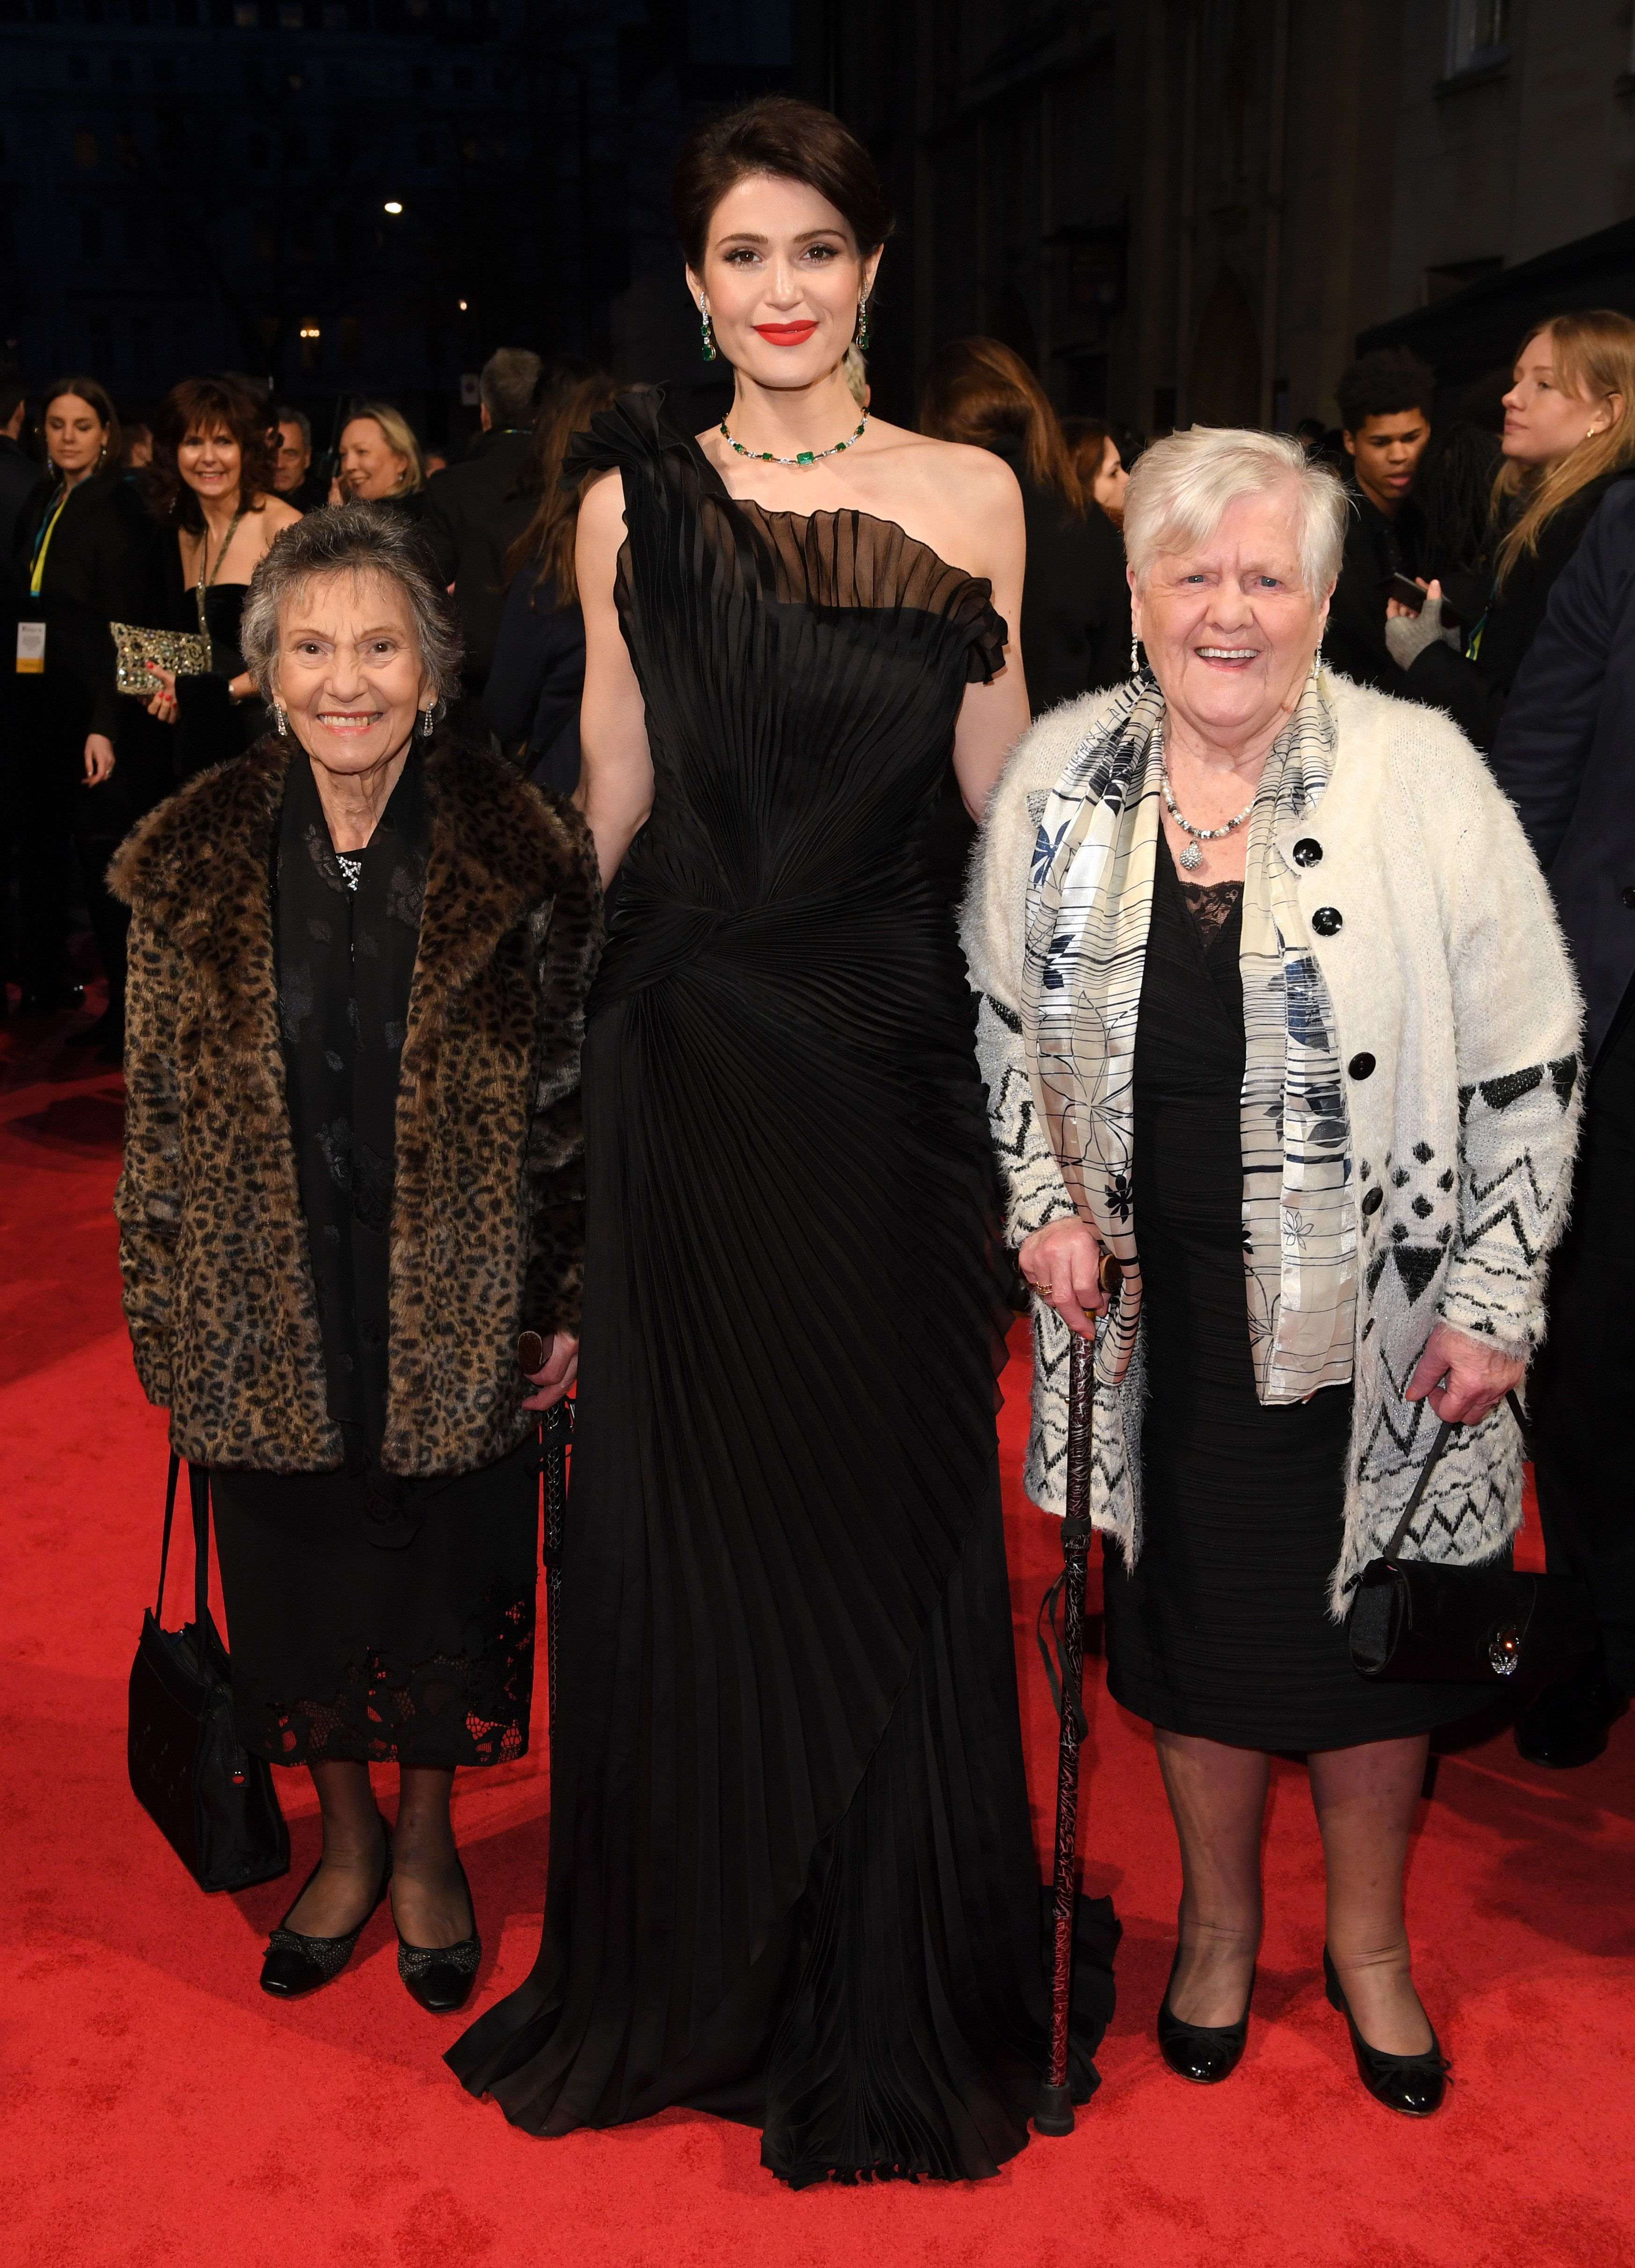 Gemma Arterton Attends The Baftas With 'Original Dagenham Girls' Gwen Davis And Eileen